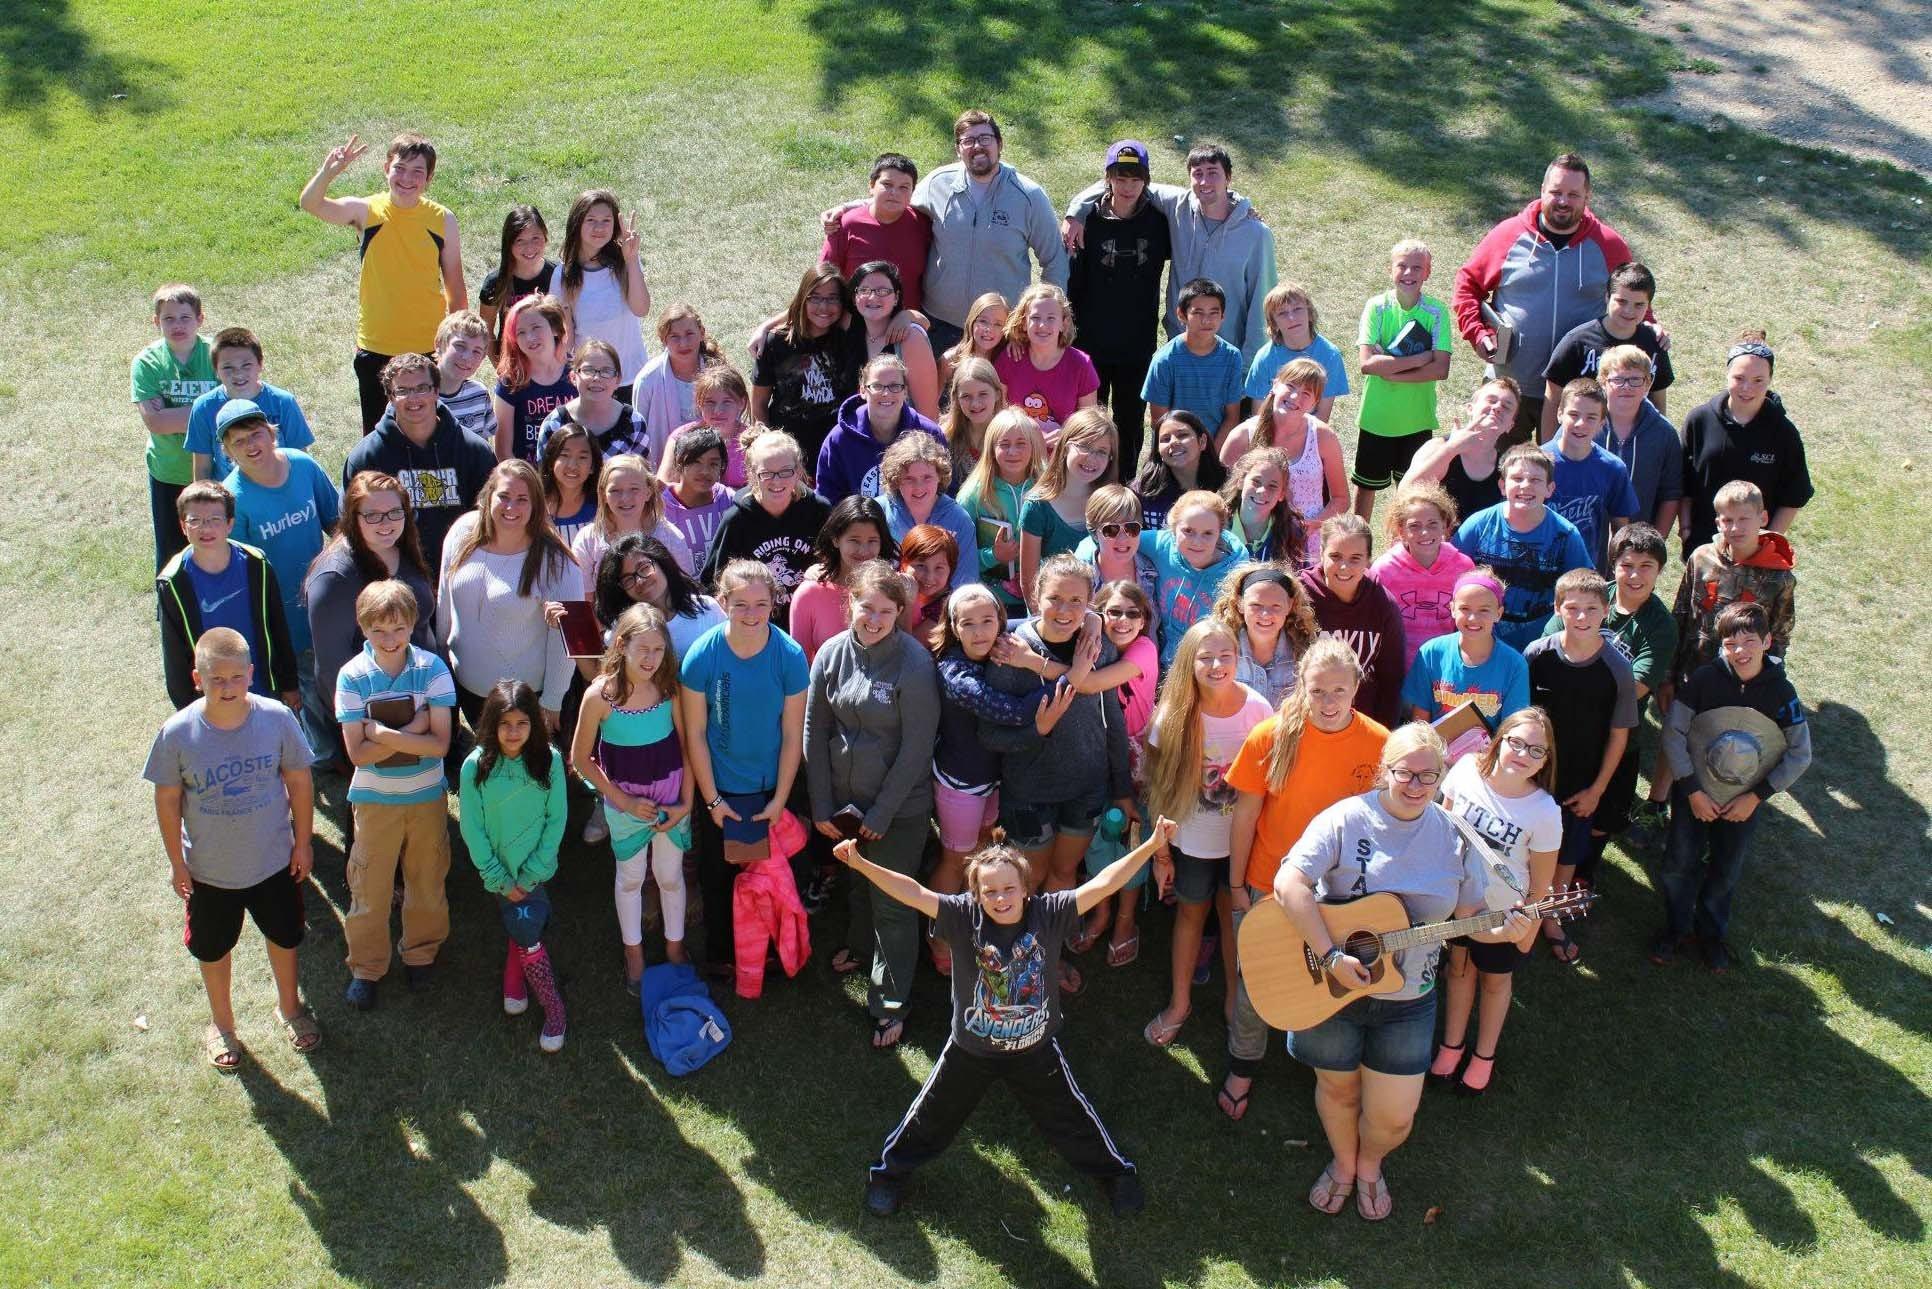 Kid's Camp 2015